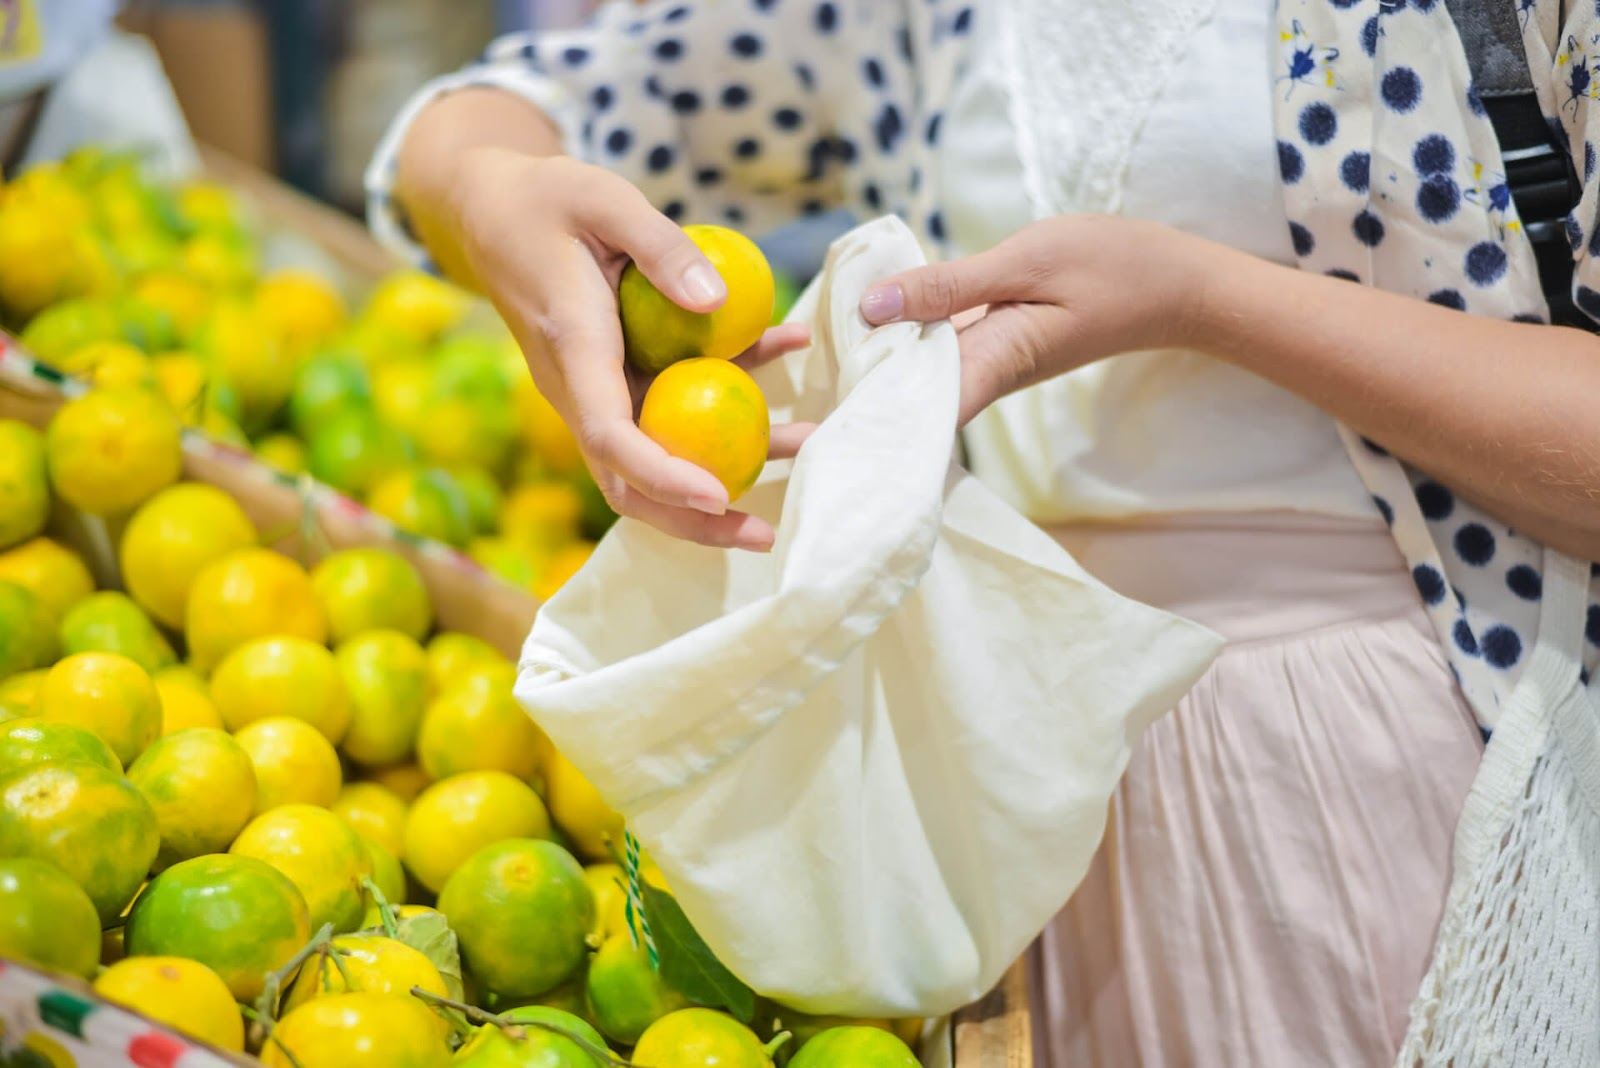 Woman putting lemons in her reusable shopping bag